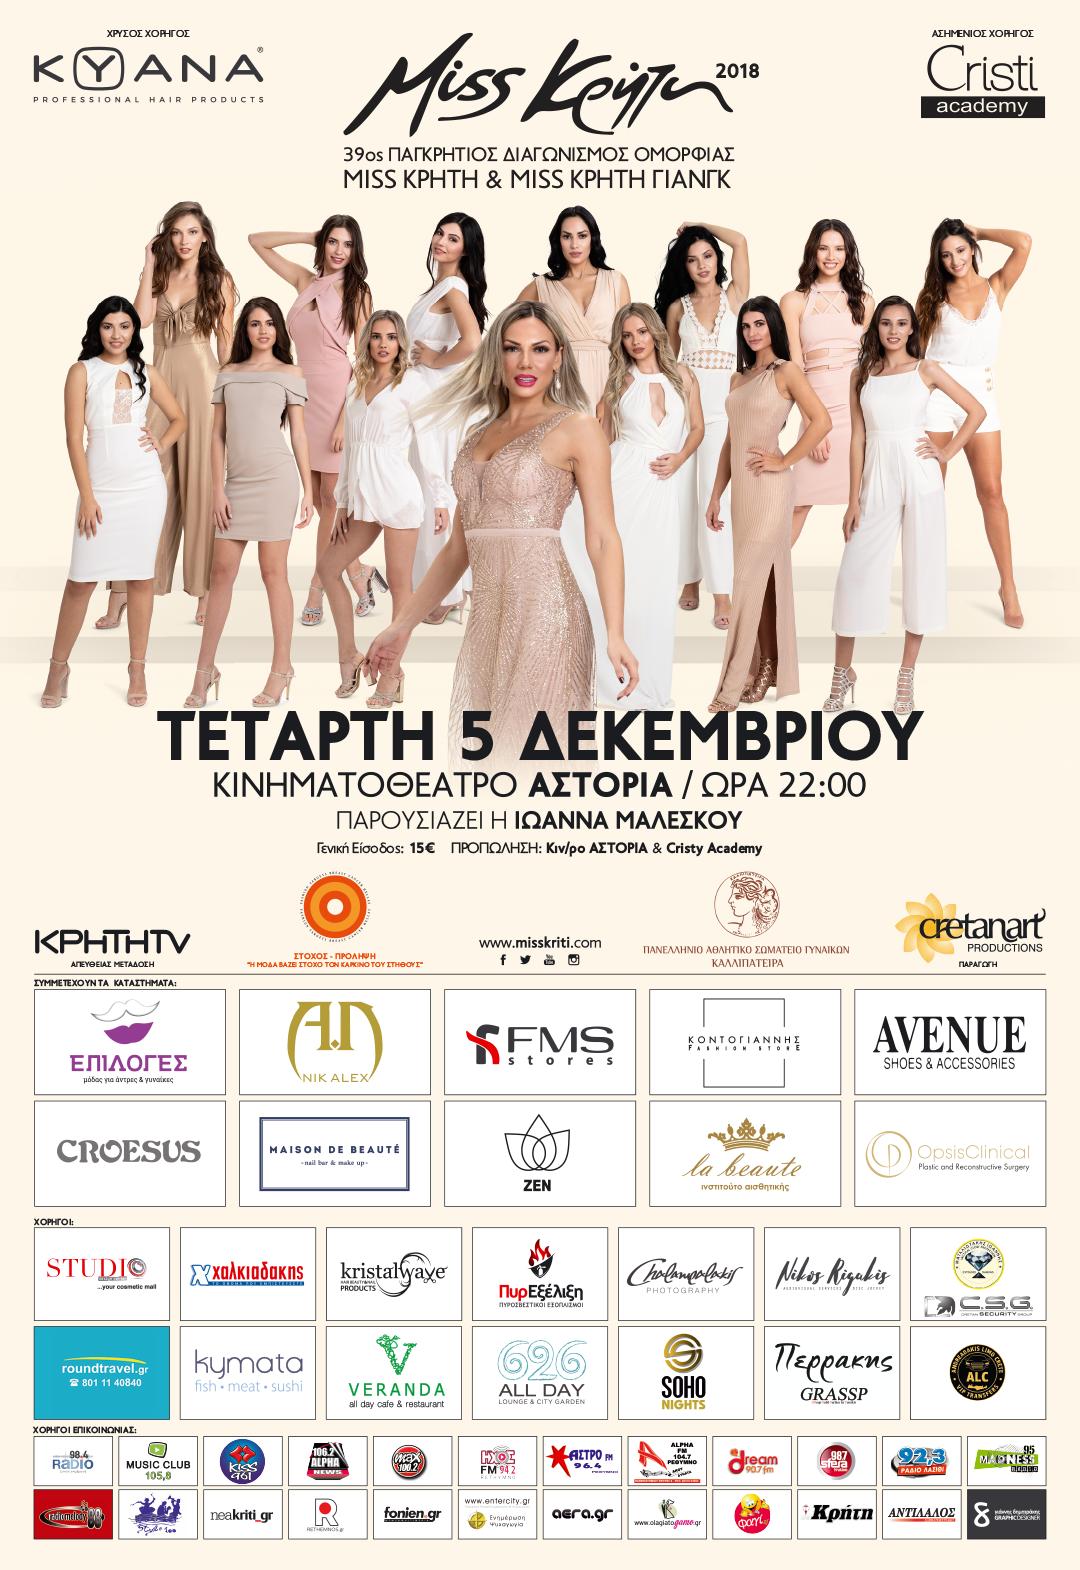 f28aae45cb8 iraklioblog.blogspot.com: Miss Κρήτη 2018 - Οι 13 φιναλίστ που ...